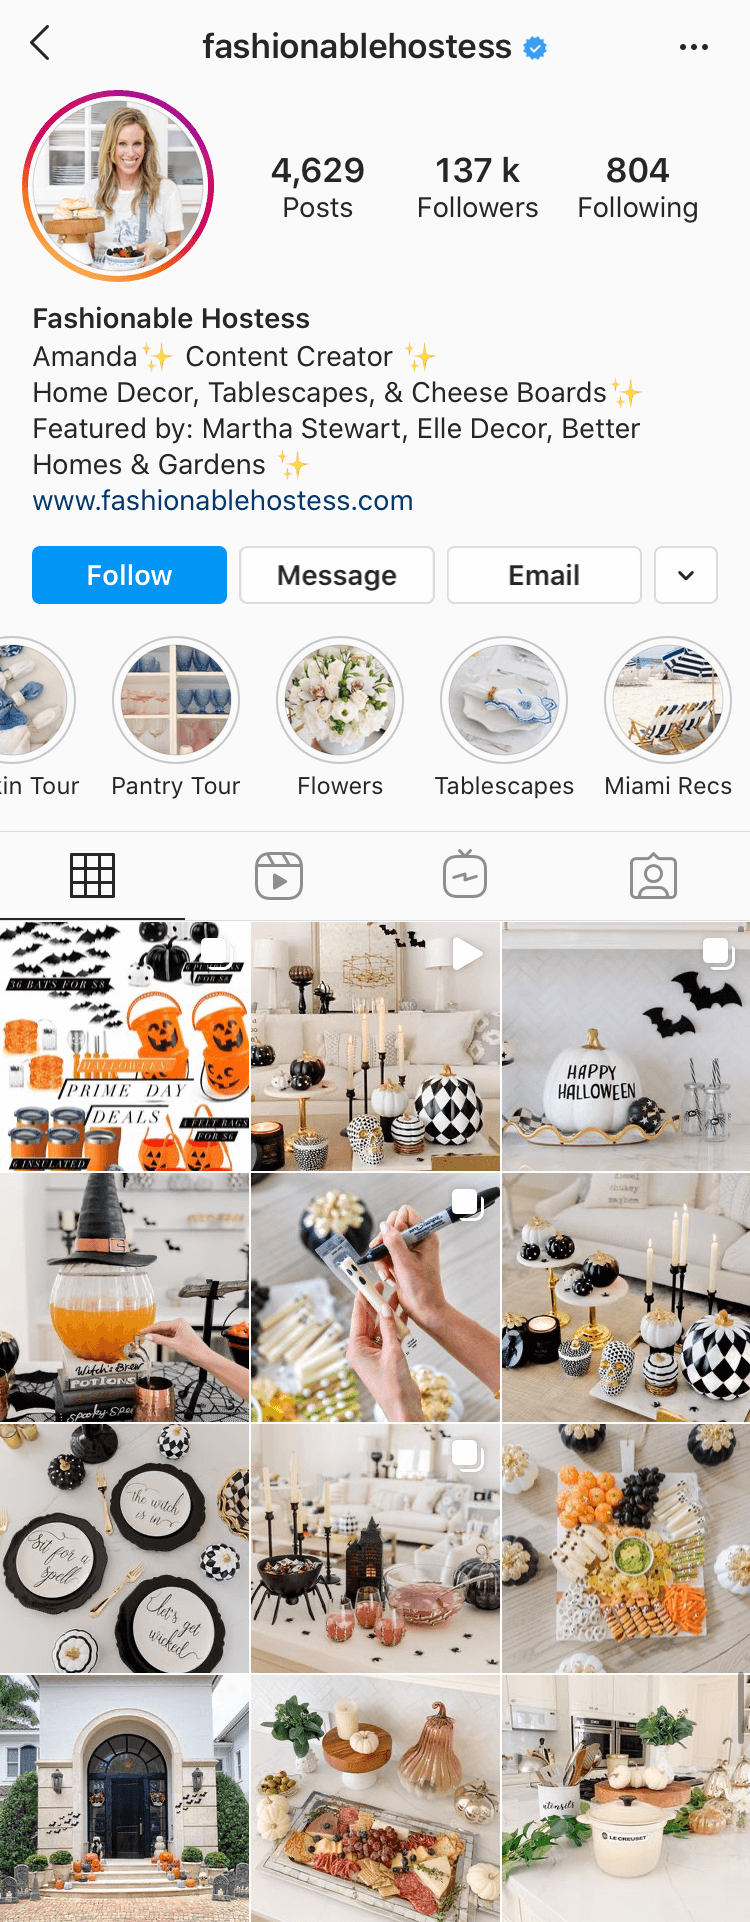 Instagram account @fashionablehostess